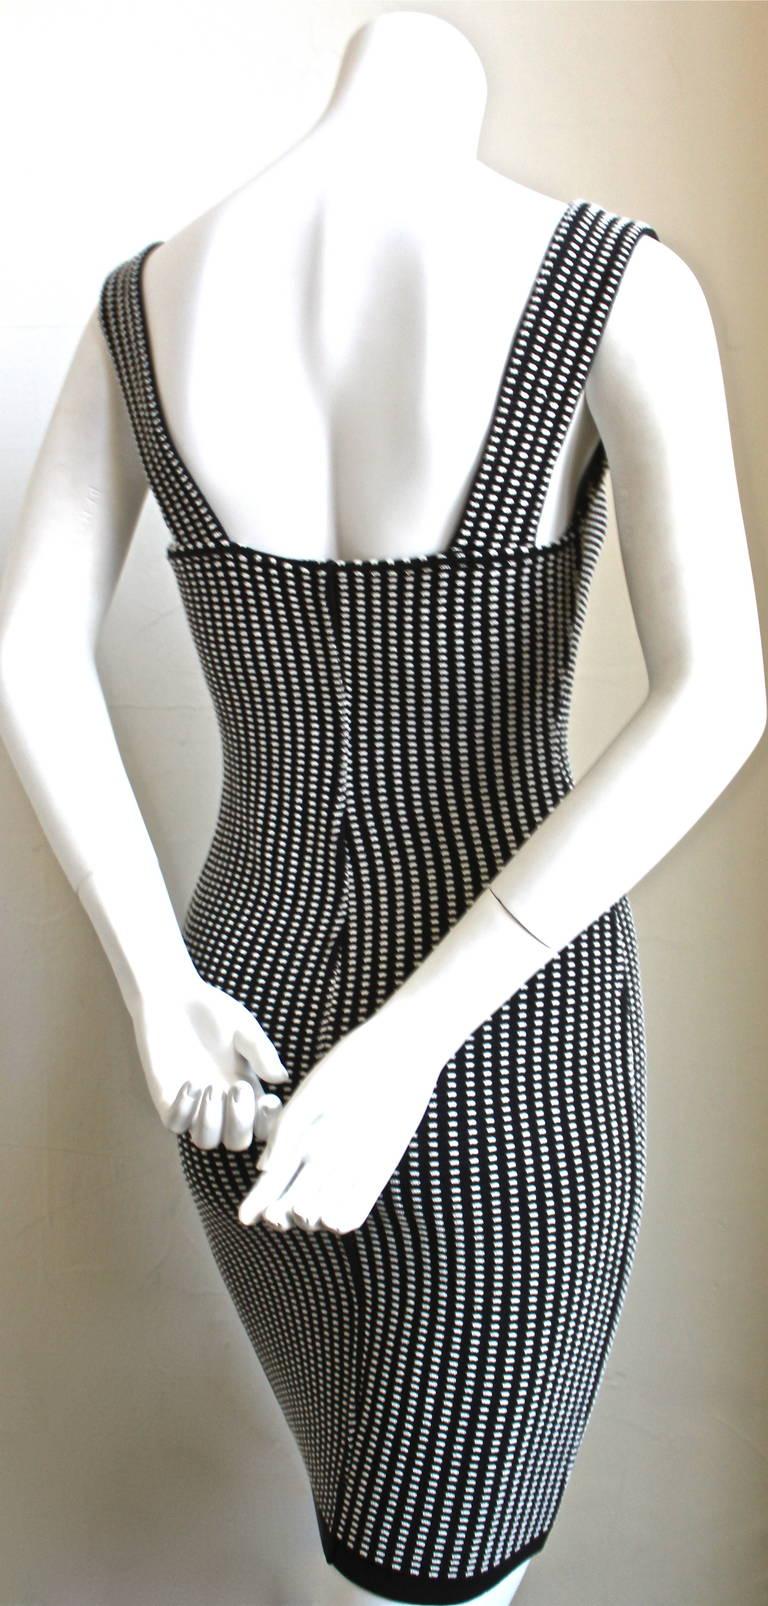 1990's AZZEDINE ALAIA black and white textured mini dress - Unworn 3